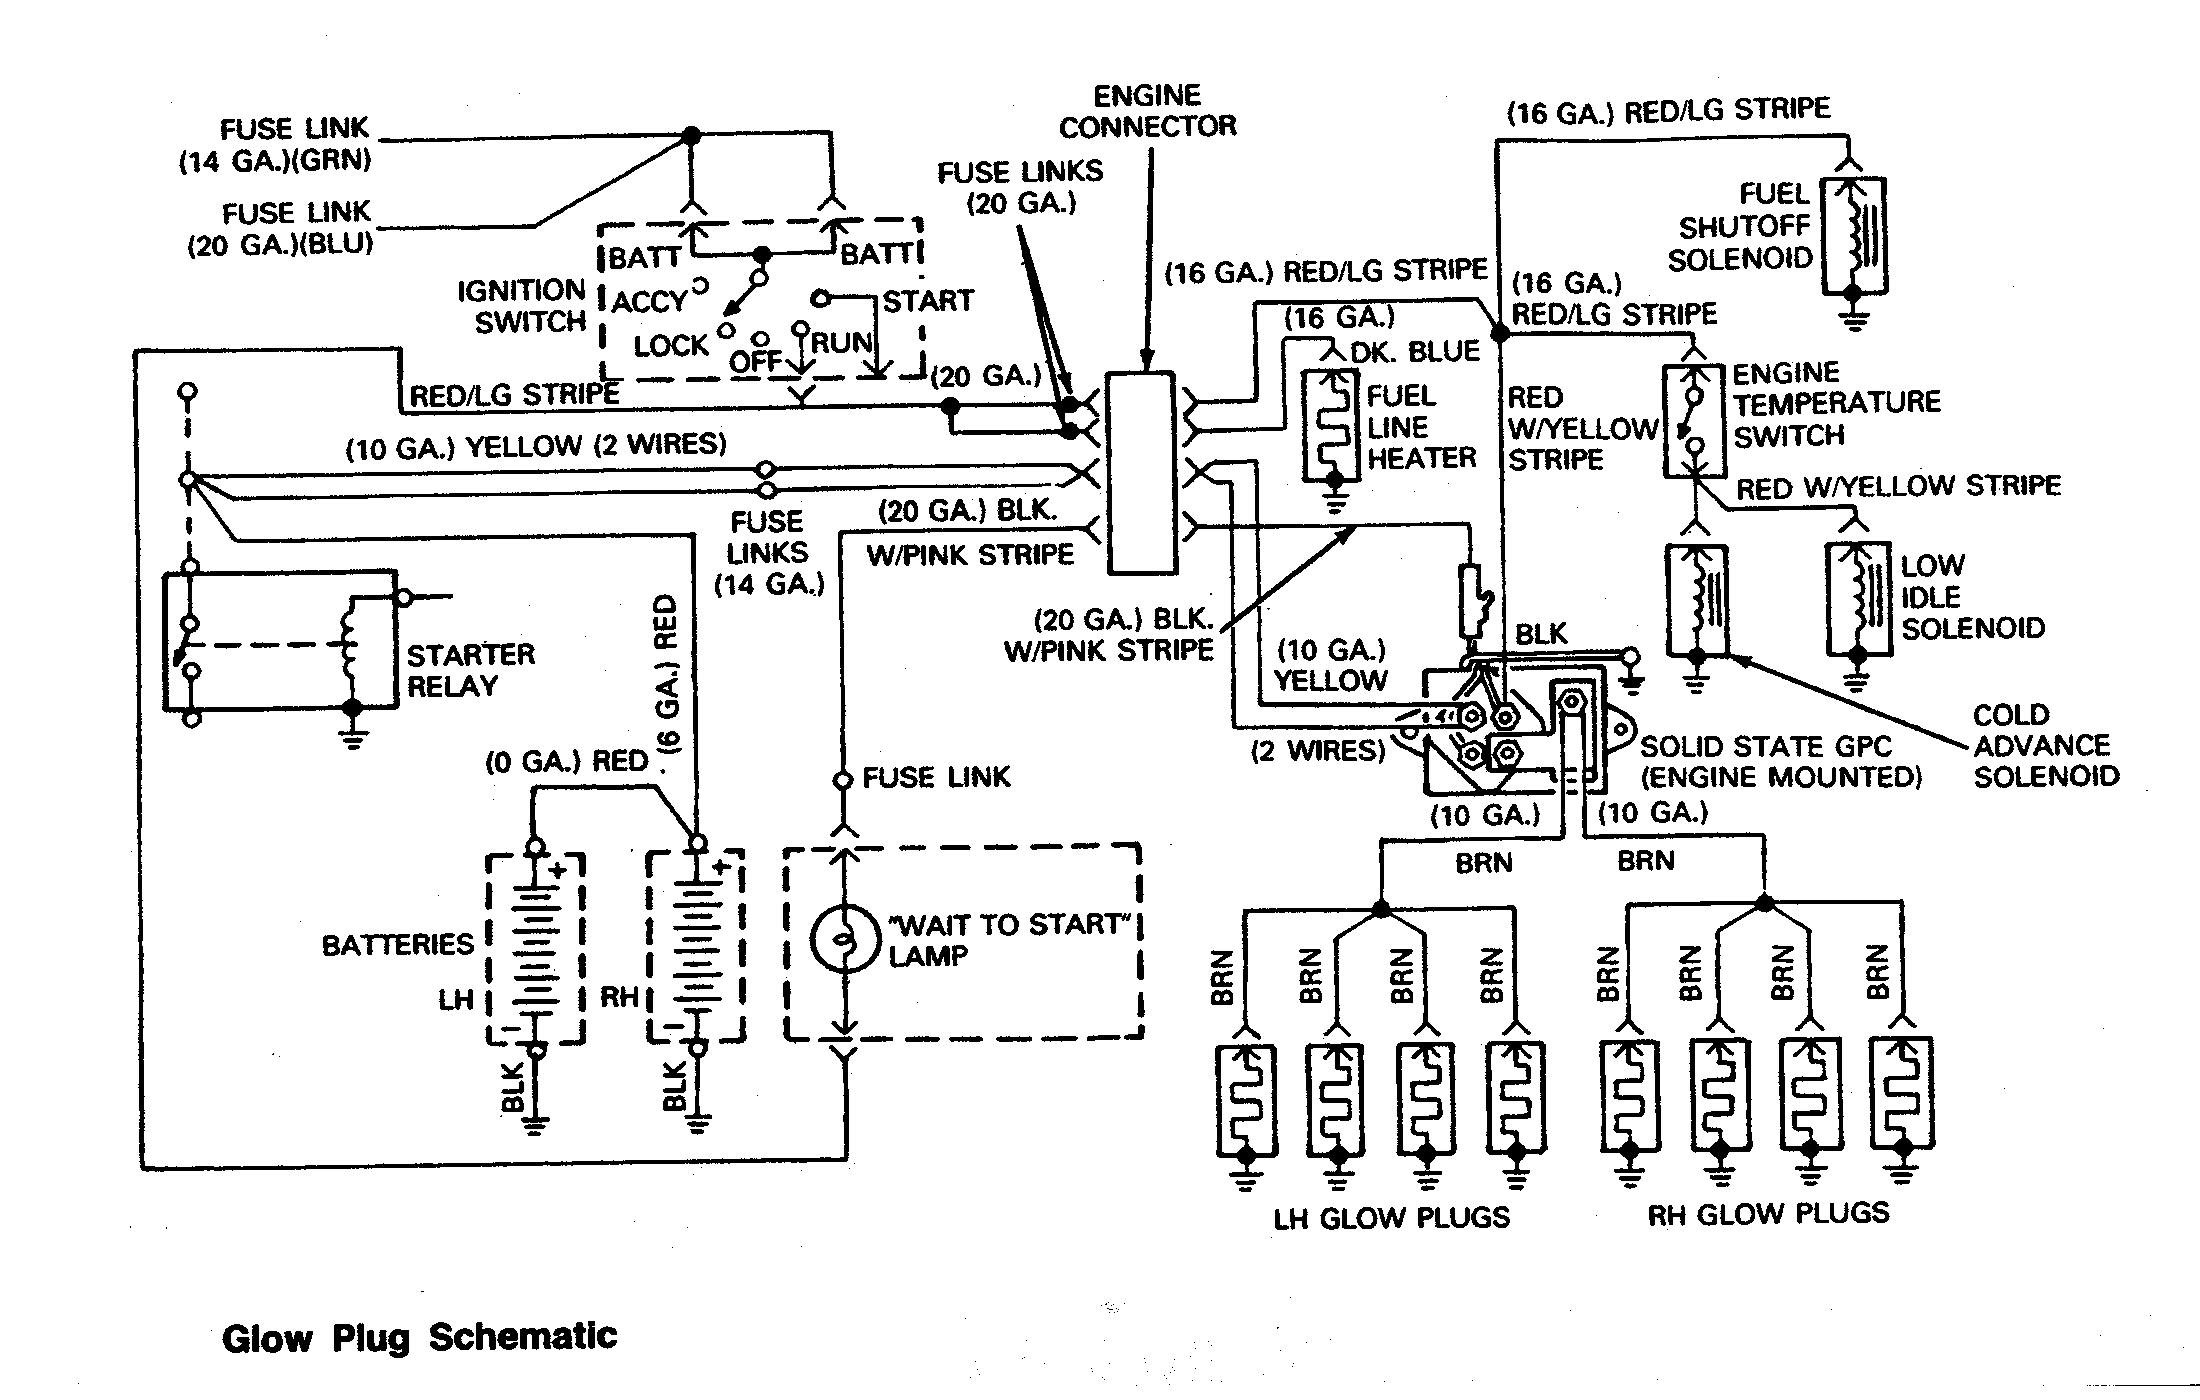 Mazda 6 Engine Parts Diagram Glow Engine Diagram Experts Wiring Diagram • Of Mazda 6 Engine Parts Diagram